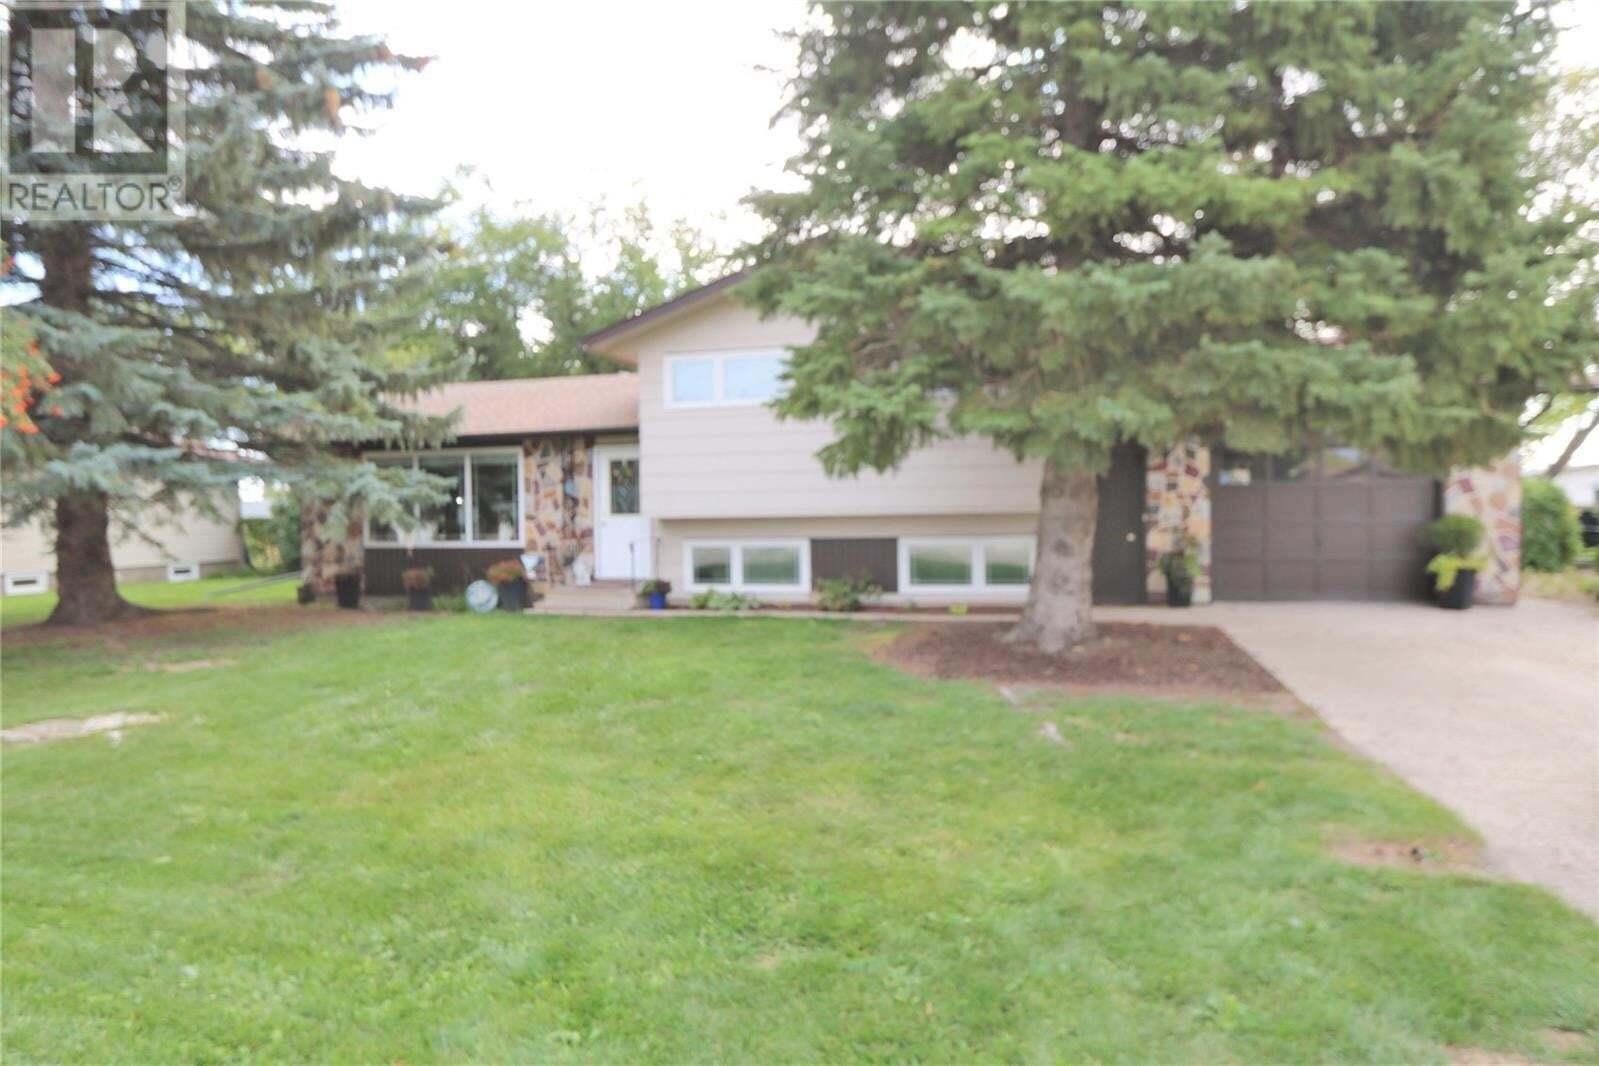 House for sale at 486 Circlebrooke Dr Yorkton Saskatchewan - MLS: SK826135